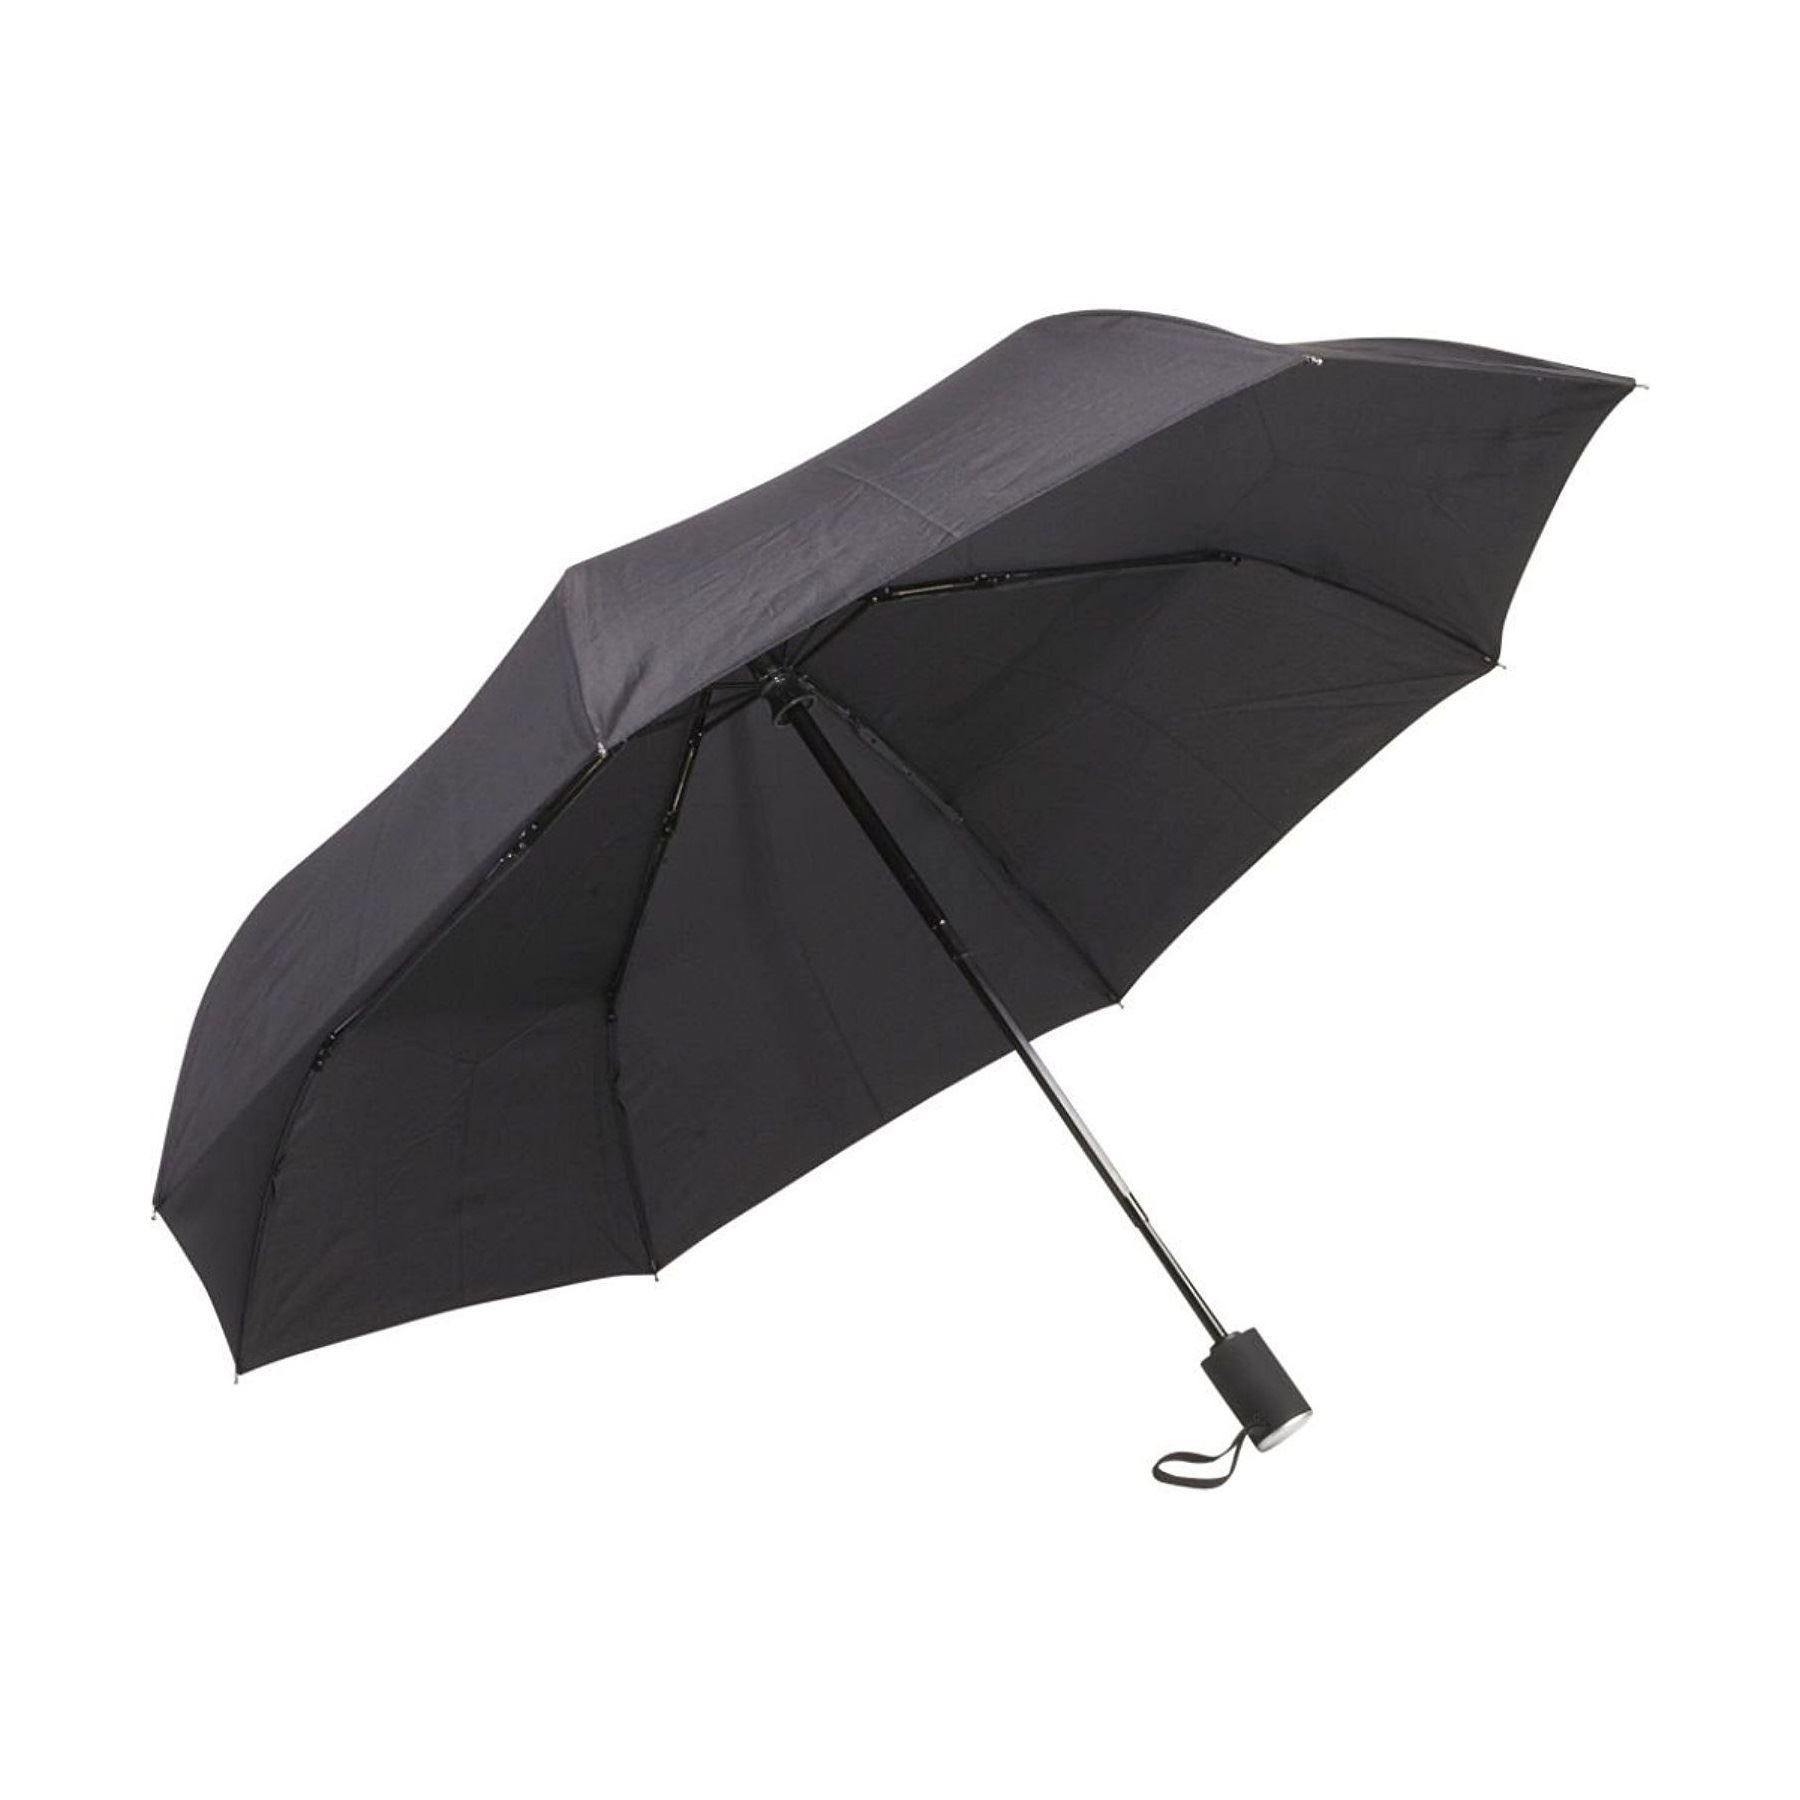 Men/'s Compact Auto Open /& Close Black Umbrella with Fiberglass Windproof Frame